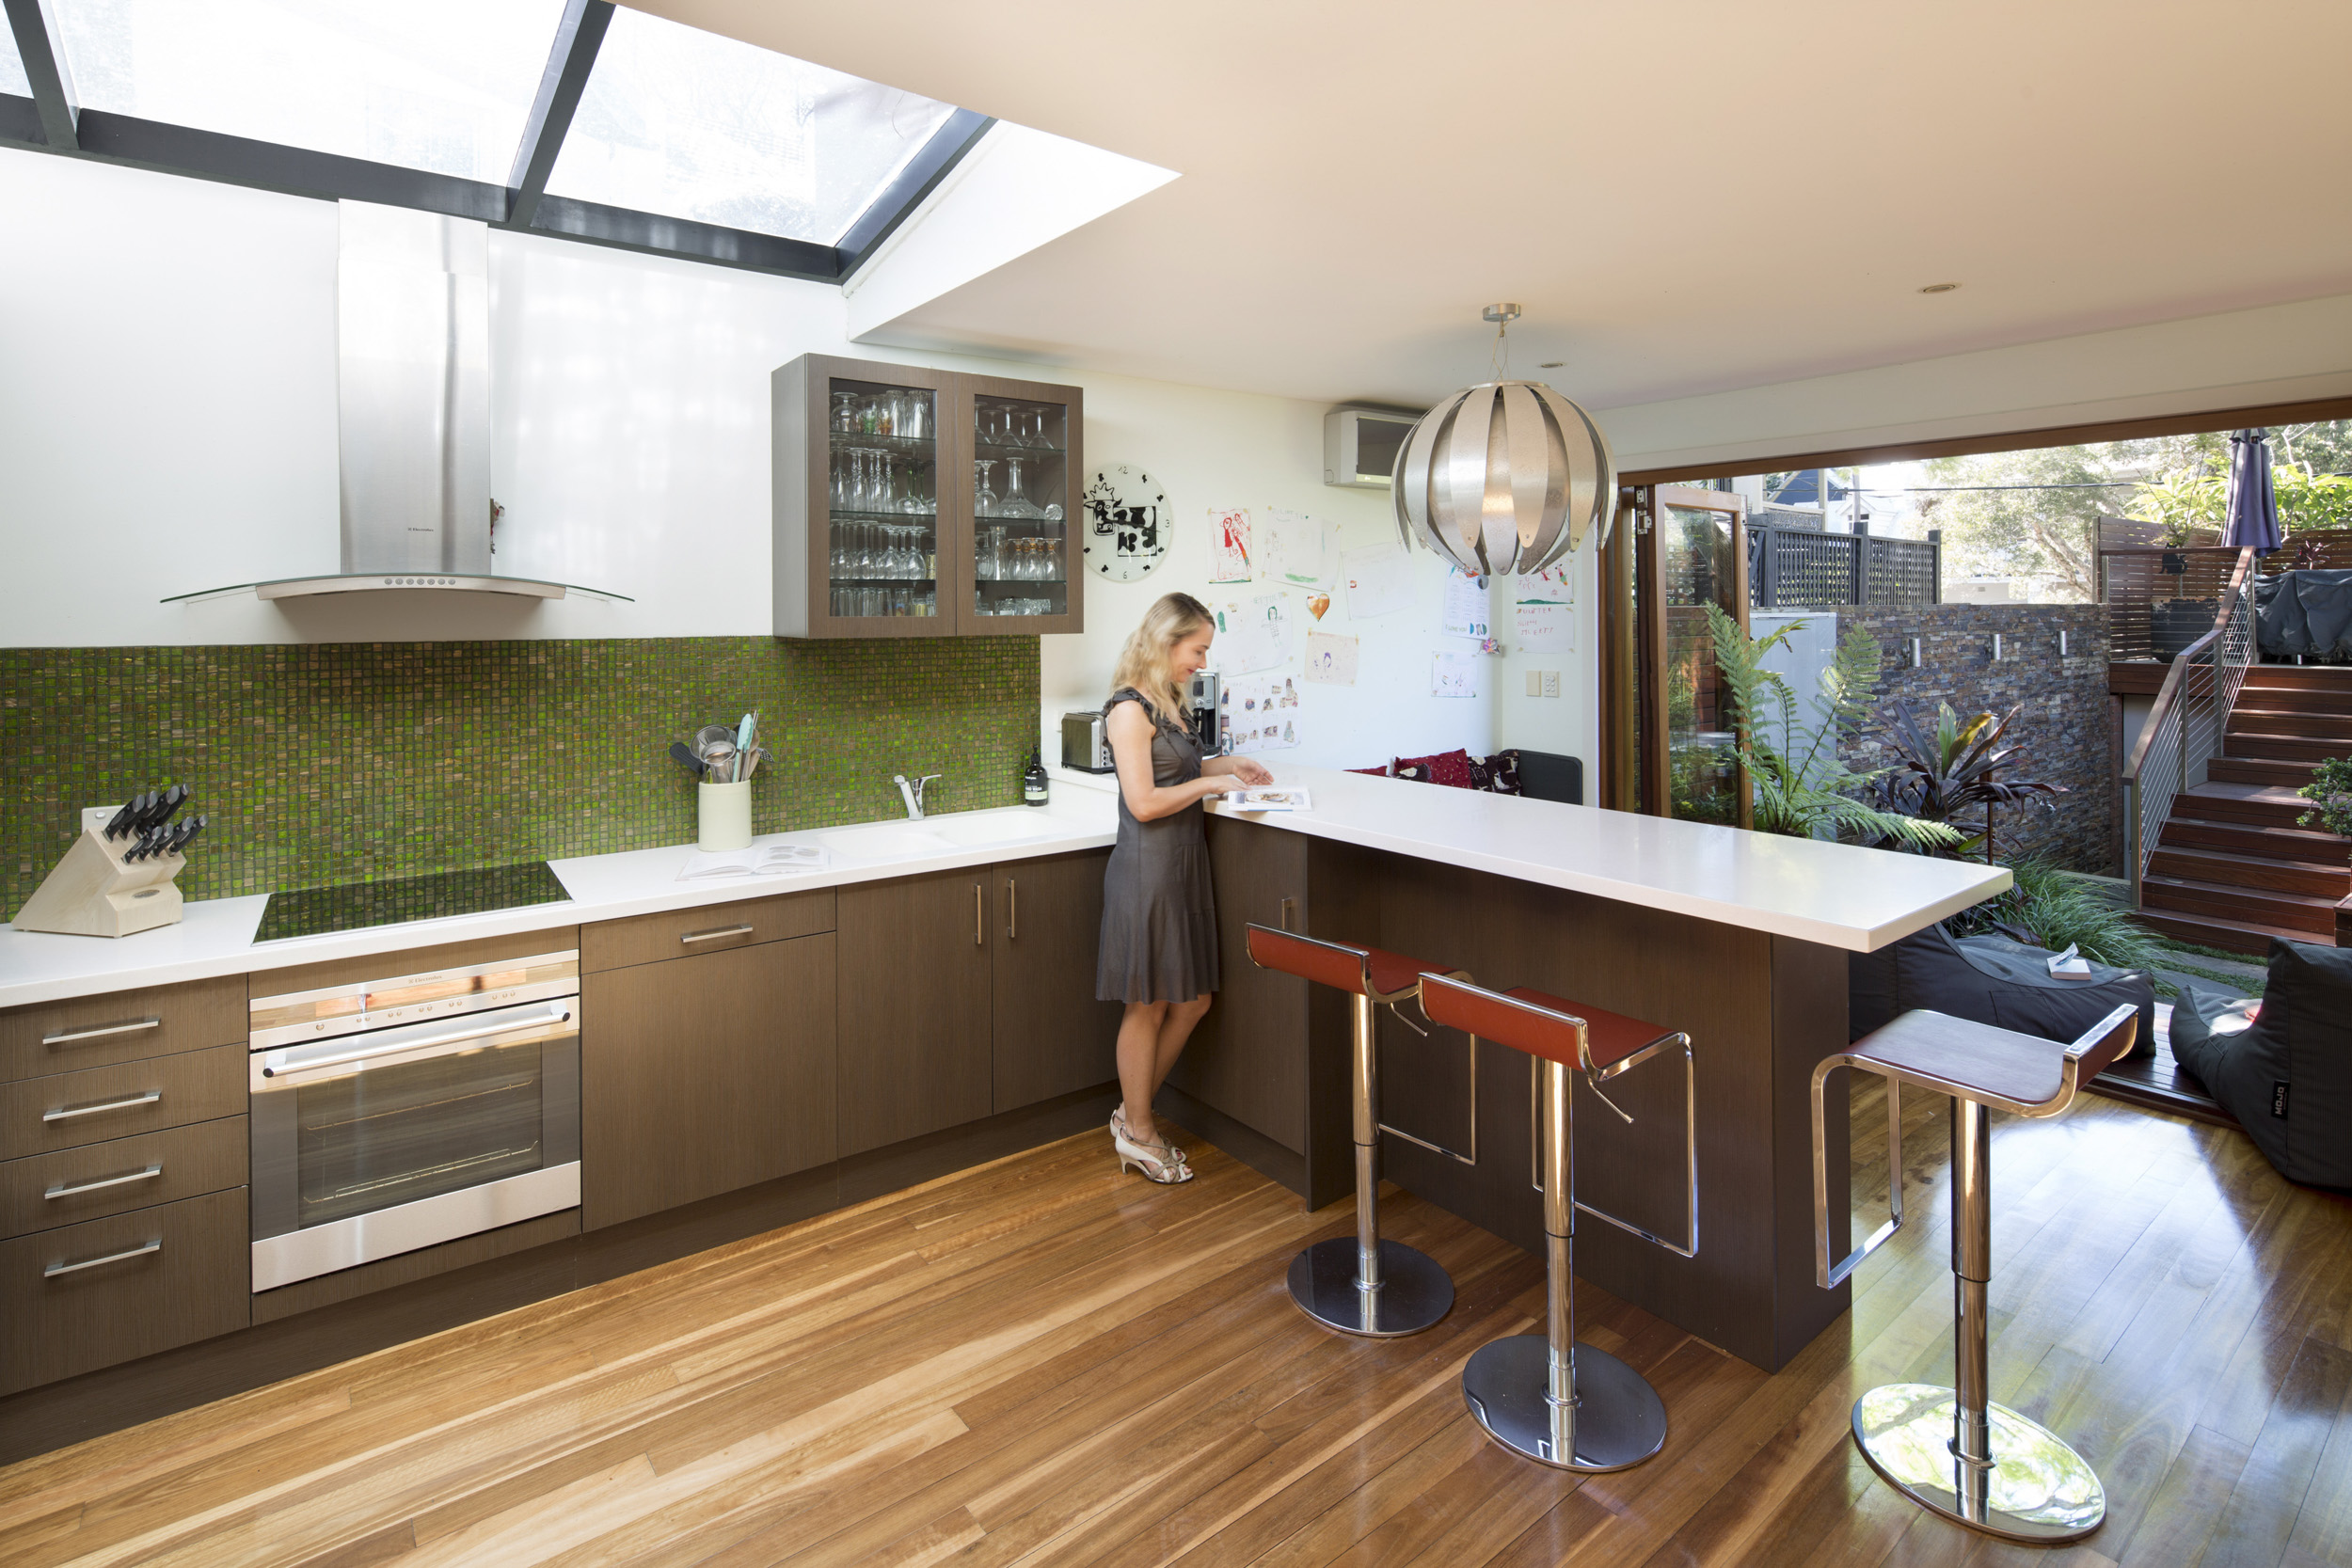 residential_architecture_sydney_australia_12.jpg